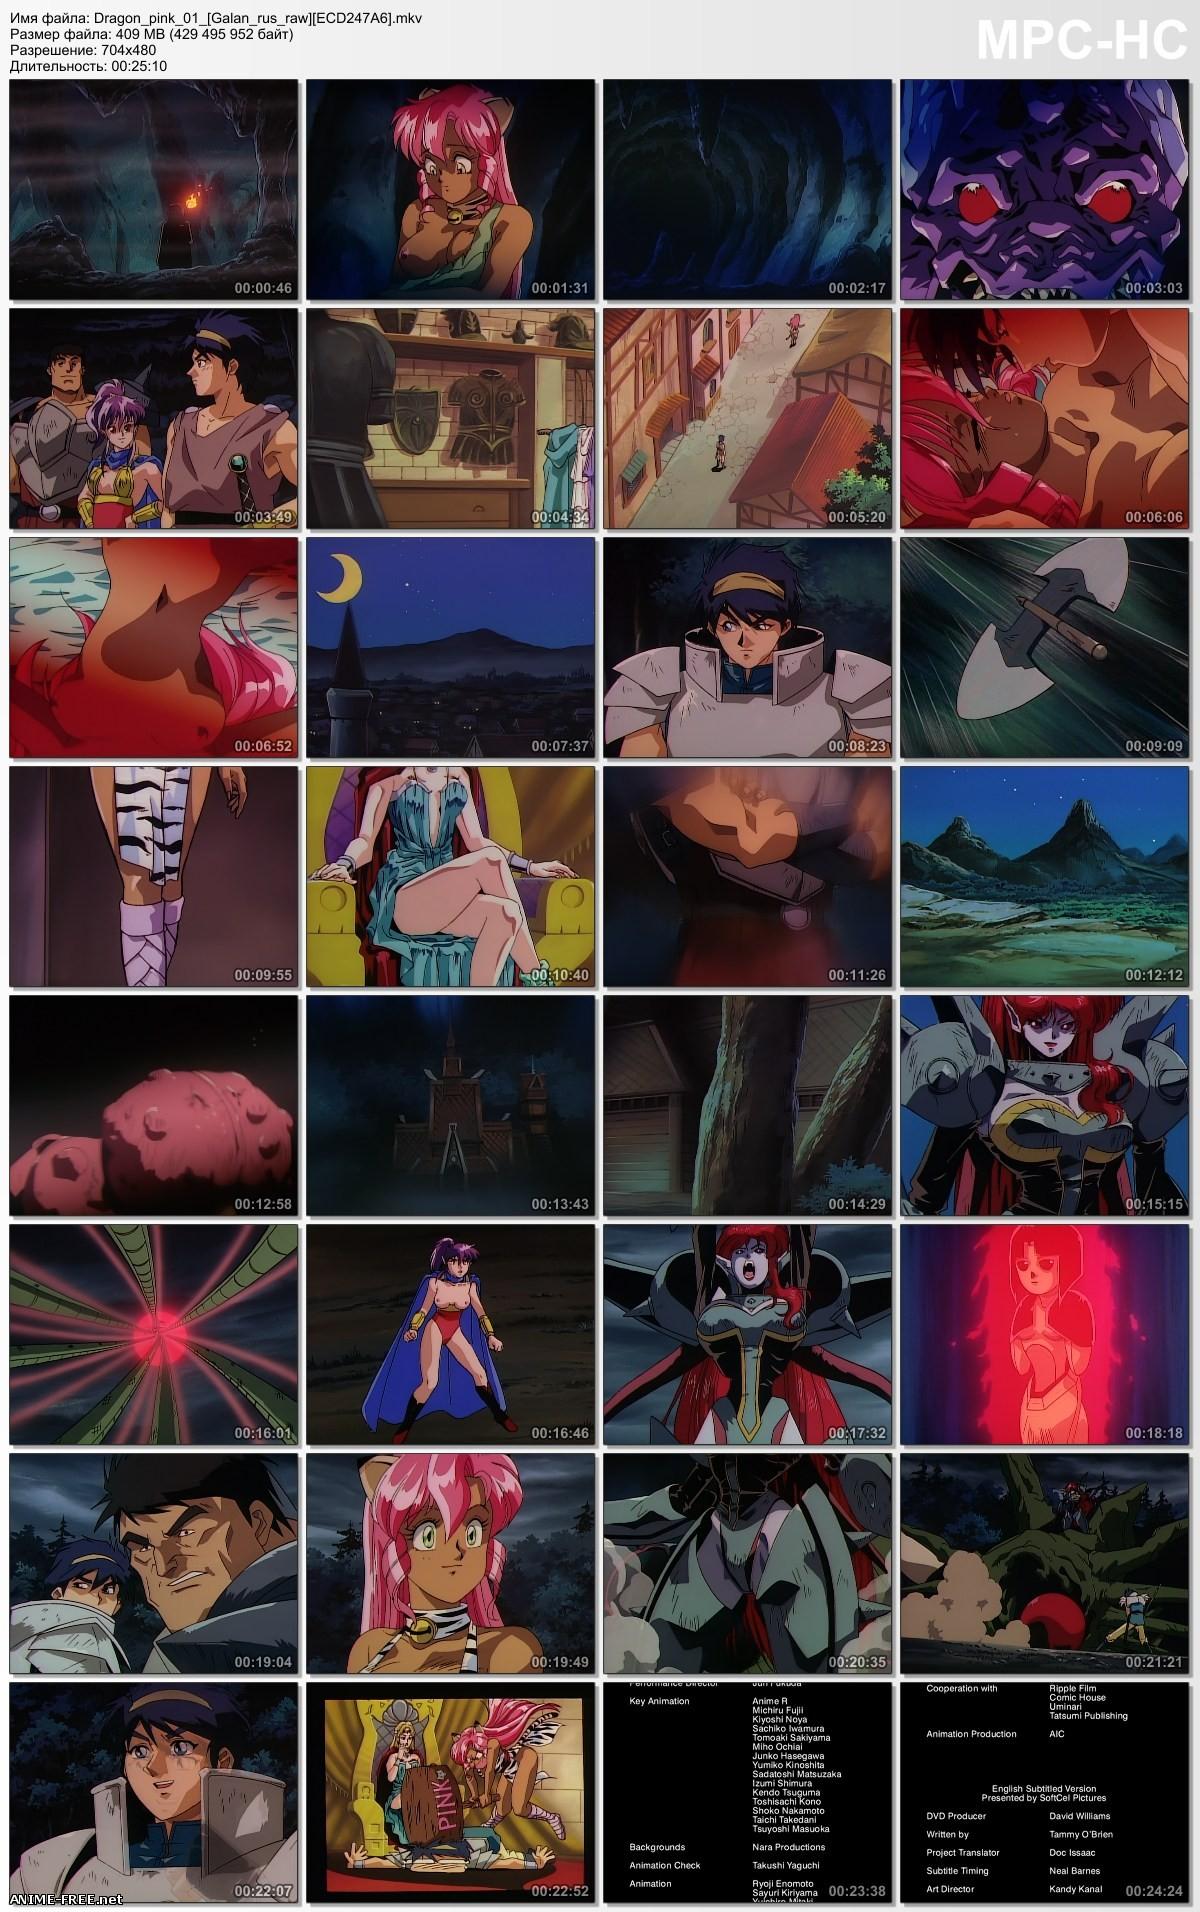 Dragon Pink / Розовый Дракон [Ep.1-3] [RUS,GER,ENG,JAP,SPA] Anime Hentai